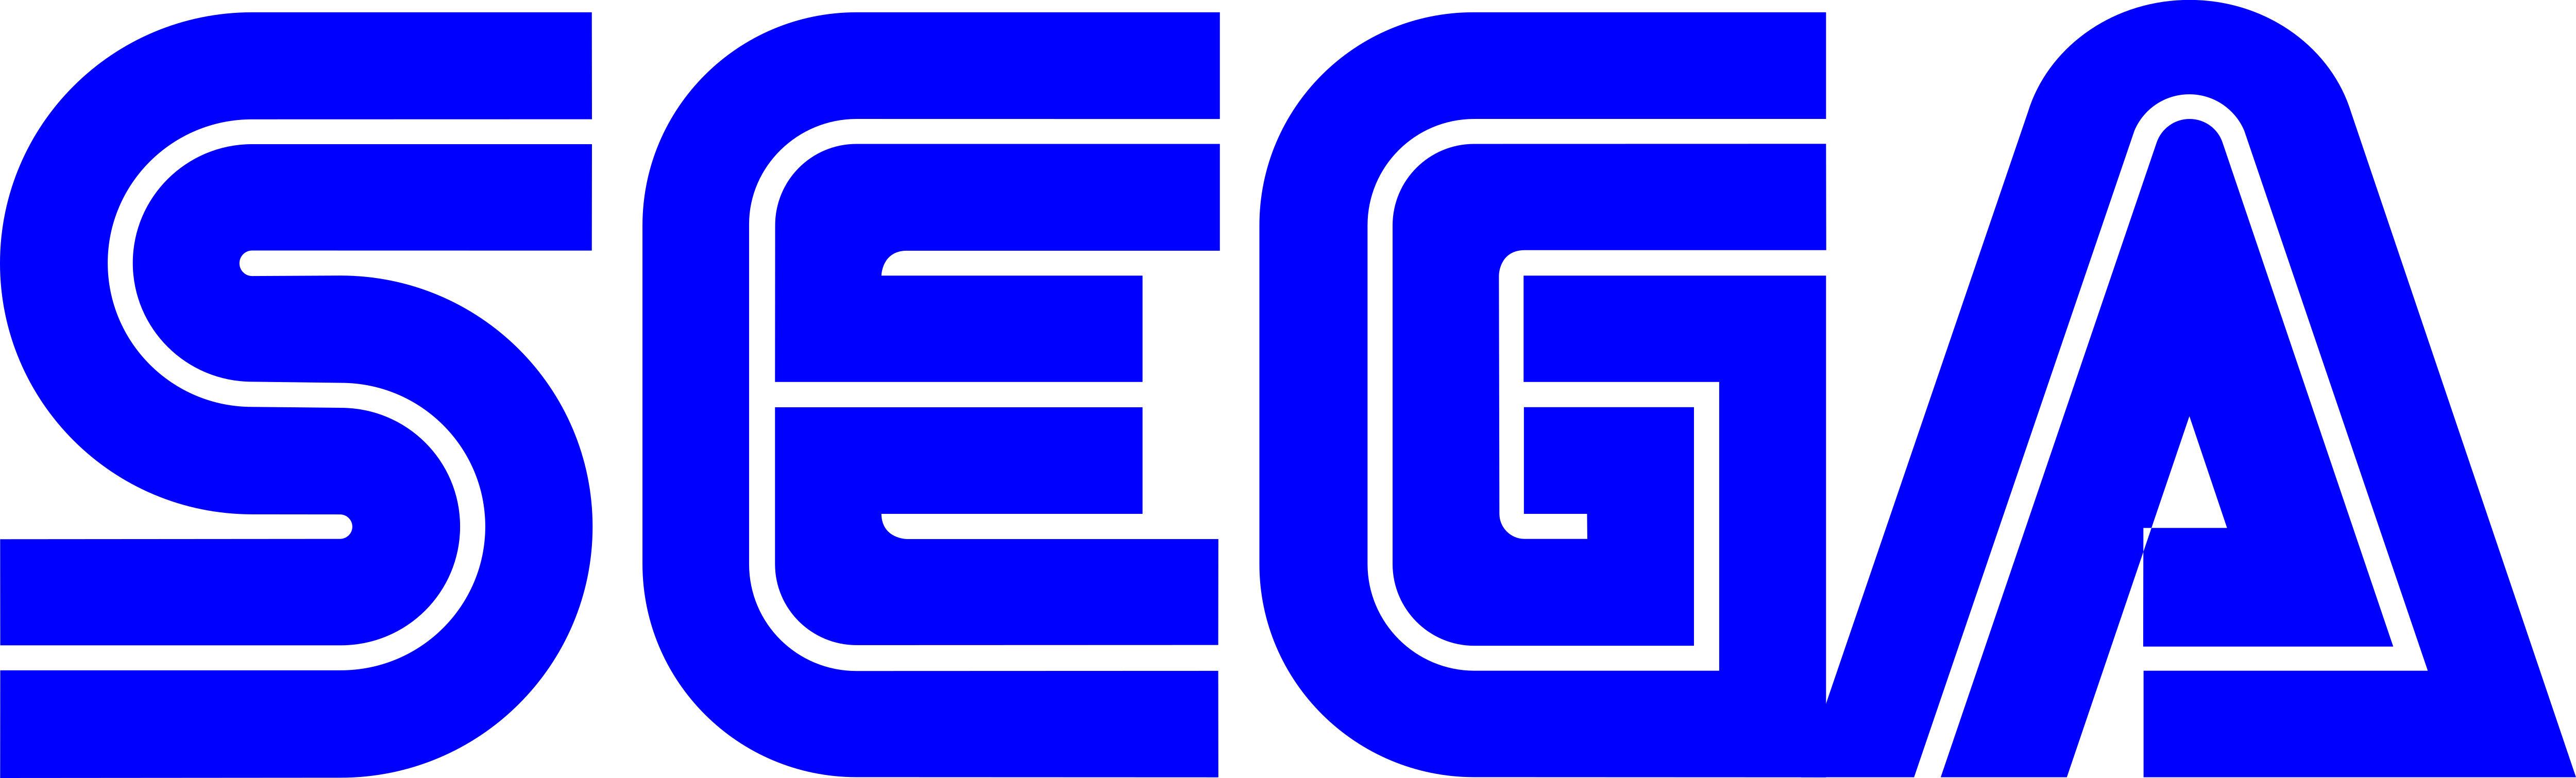 Sega – Logos Download